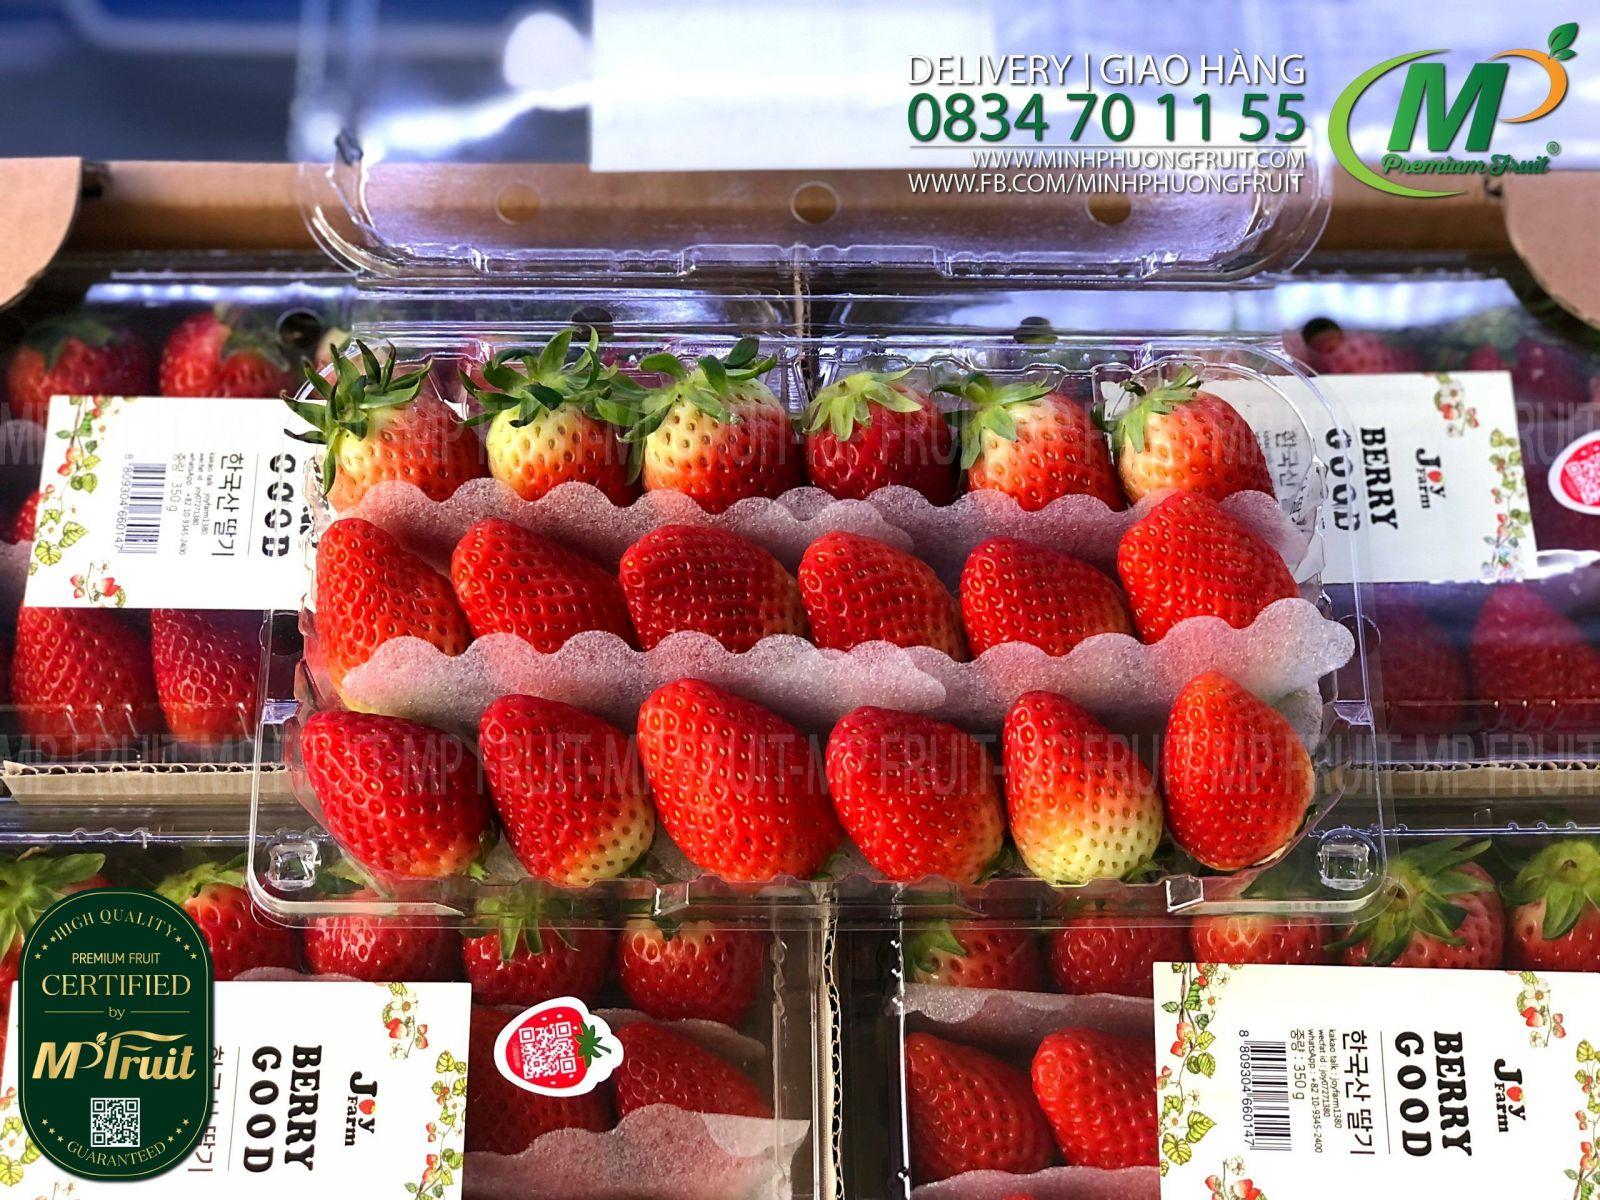 Dâu Tây Premium Hàn Quốc Hộp 350g Joy Farm tại MP Fruit